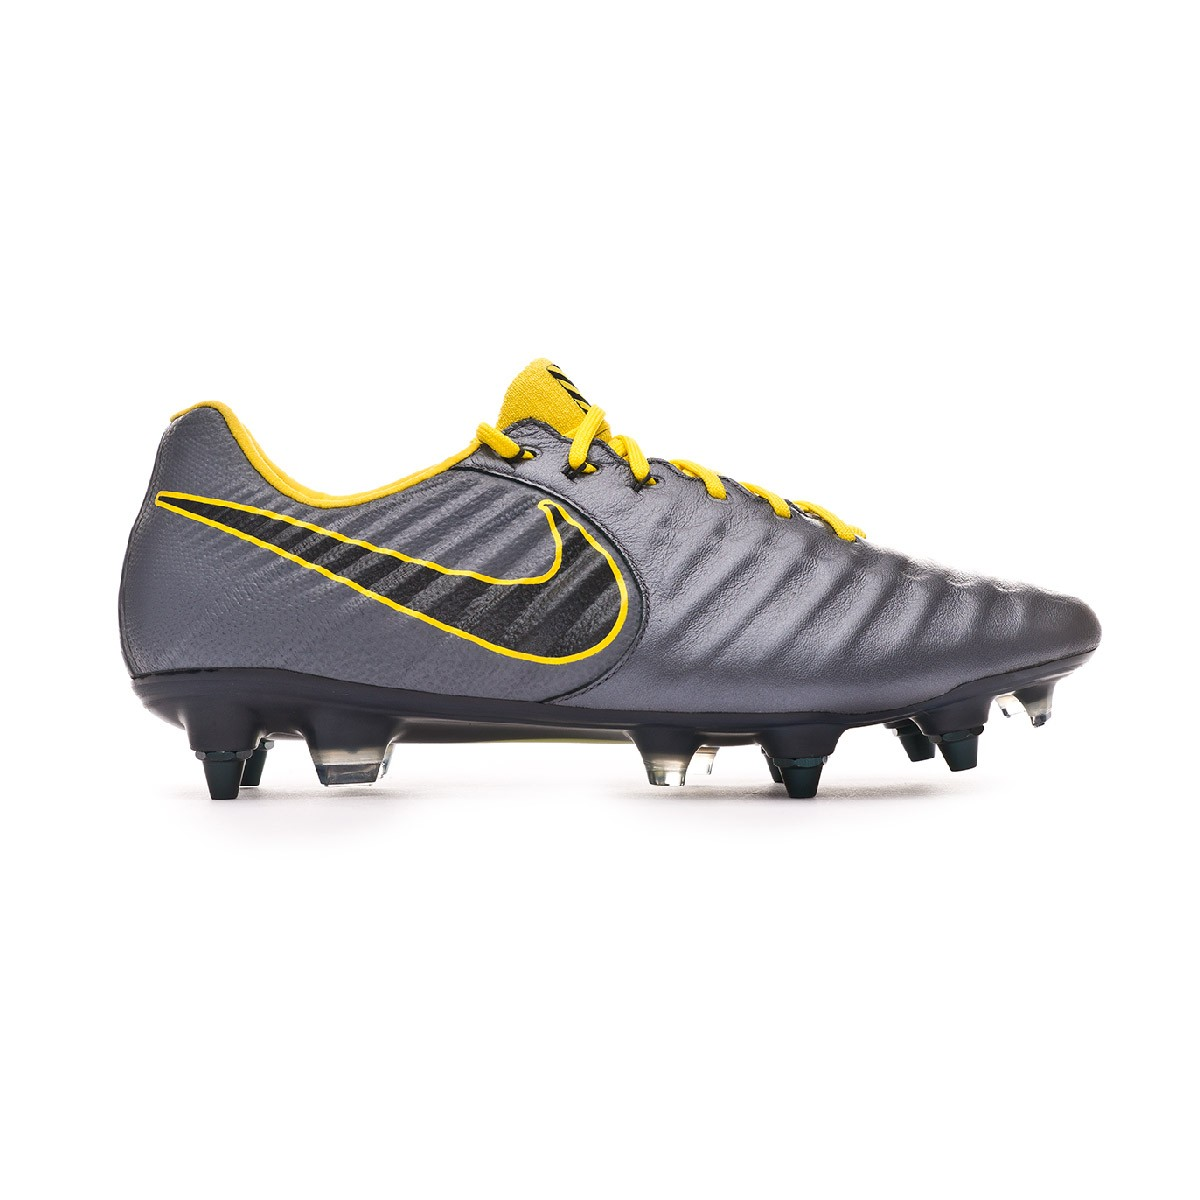 8553fc1e4 Football Boots Nike Tiempo Legend VII Elite Anti-Clog SG-Pro Dark grey-Optical  yellow-Black - Football store Fútbol Emotion